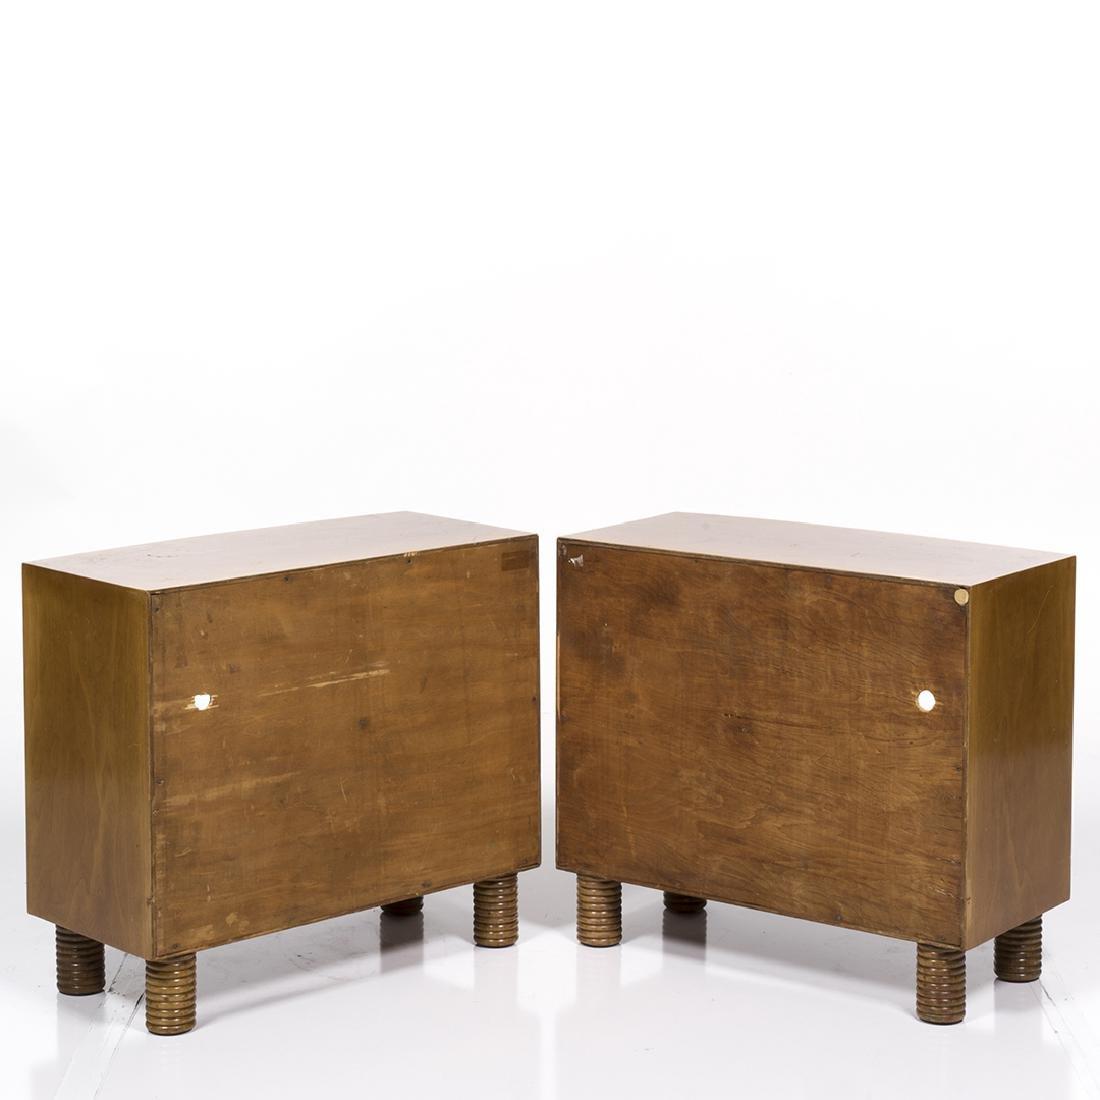 Osvaldo Borsani Bedside Cabinets (2) - 3